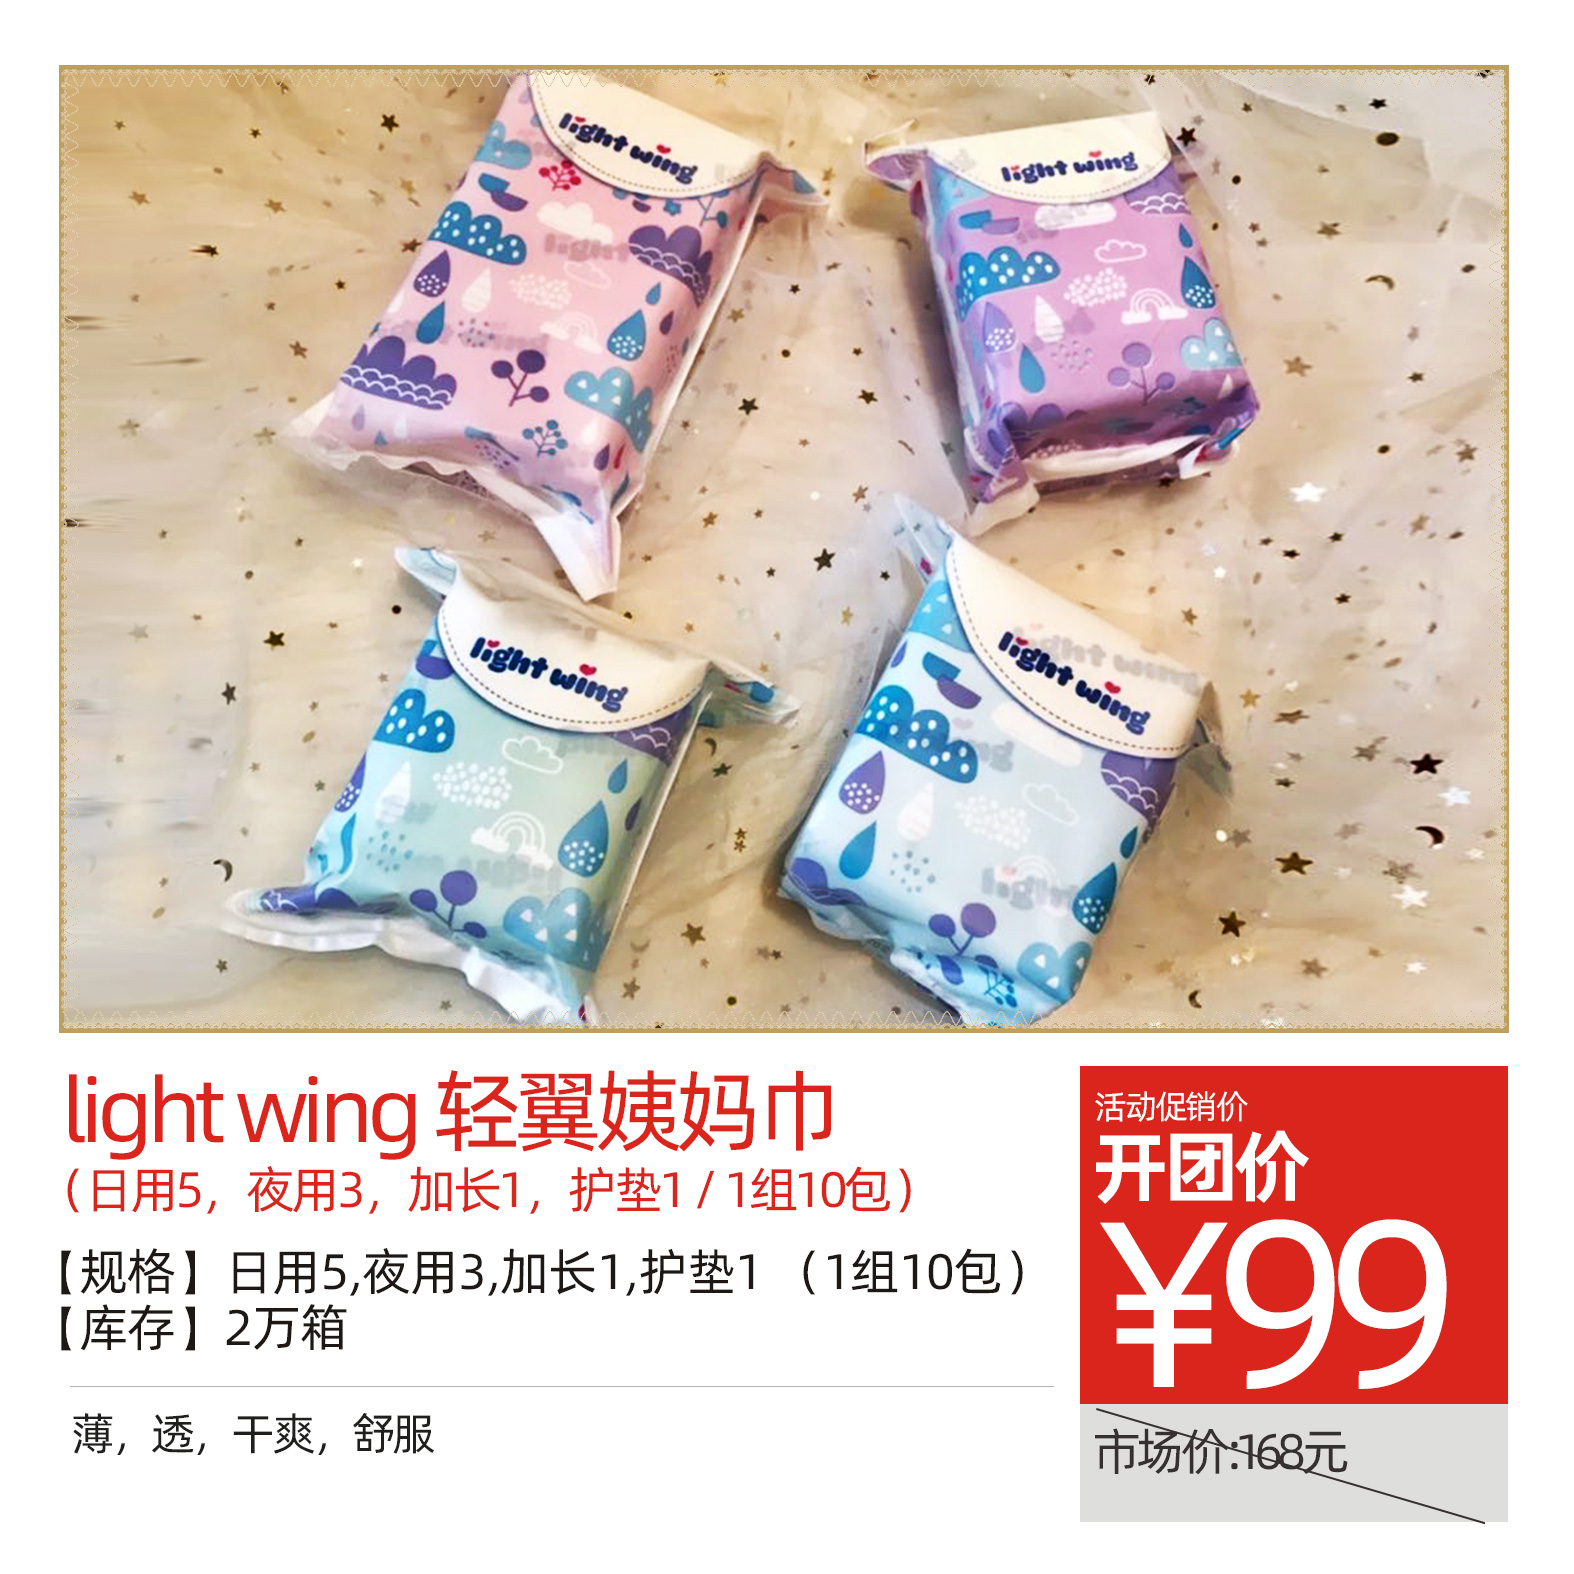 light wing 轻翼卫生巾(日用5,夜用3,加长1,护垫1 / 1组10包)